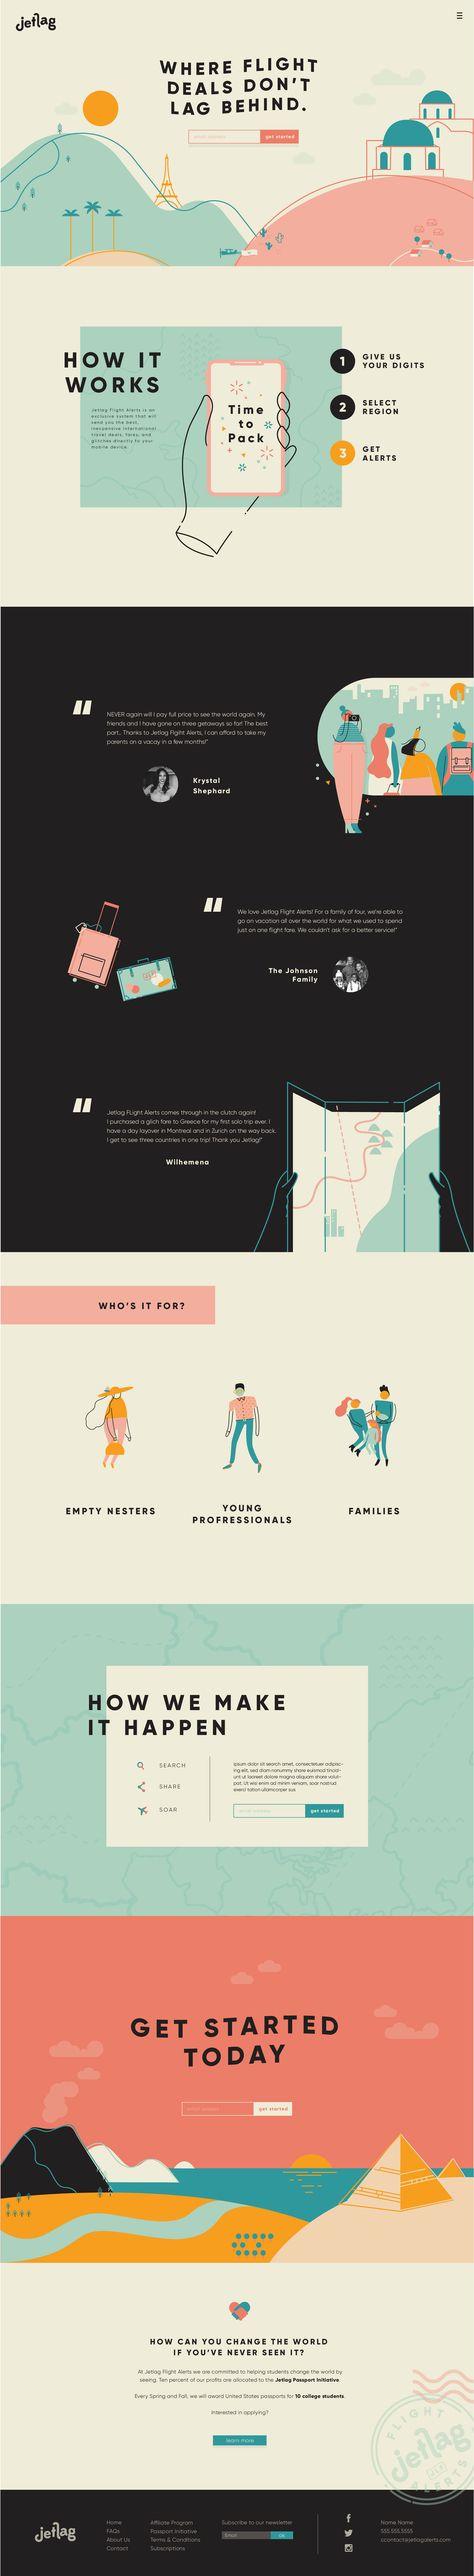 Carly Berry illustrator graphic designer - jetlag brand identity